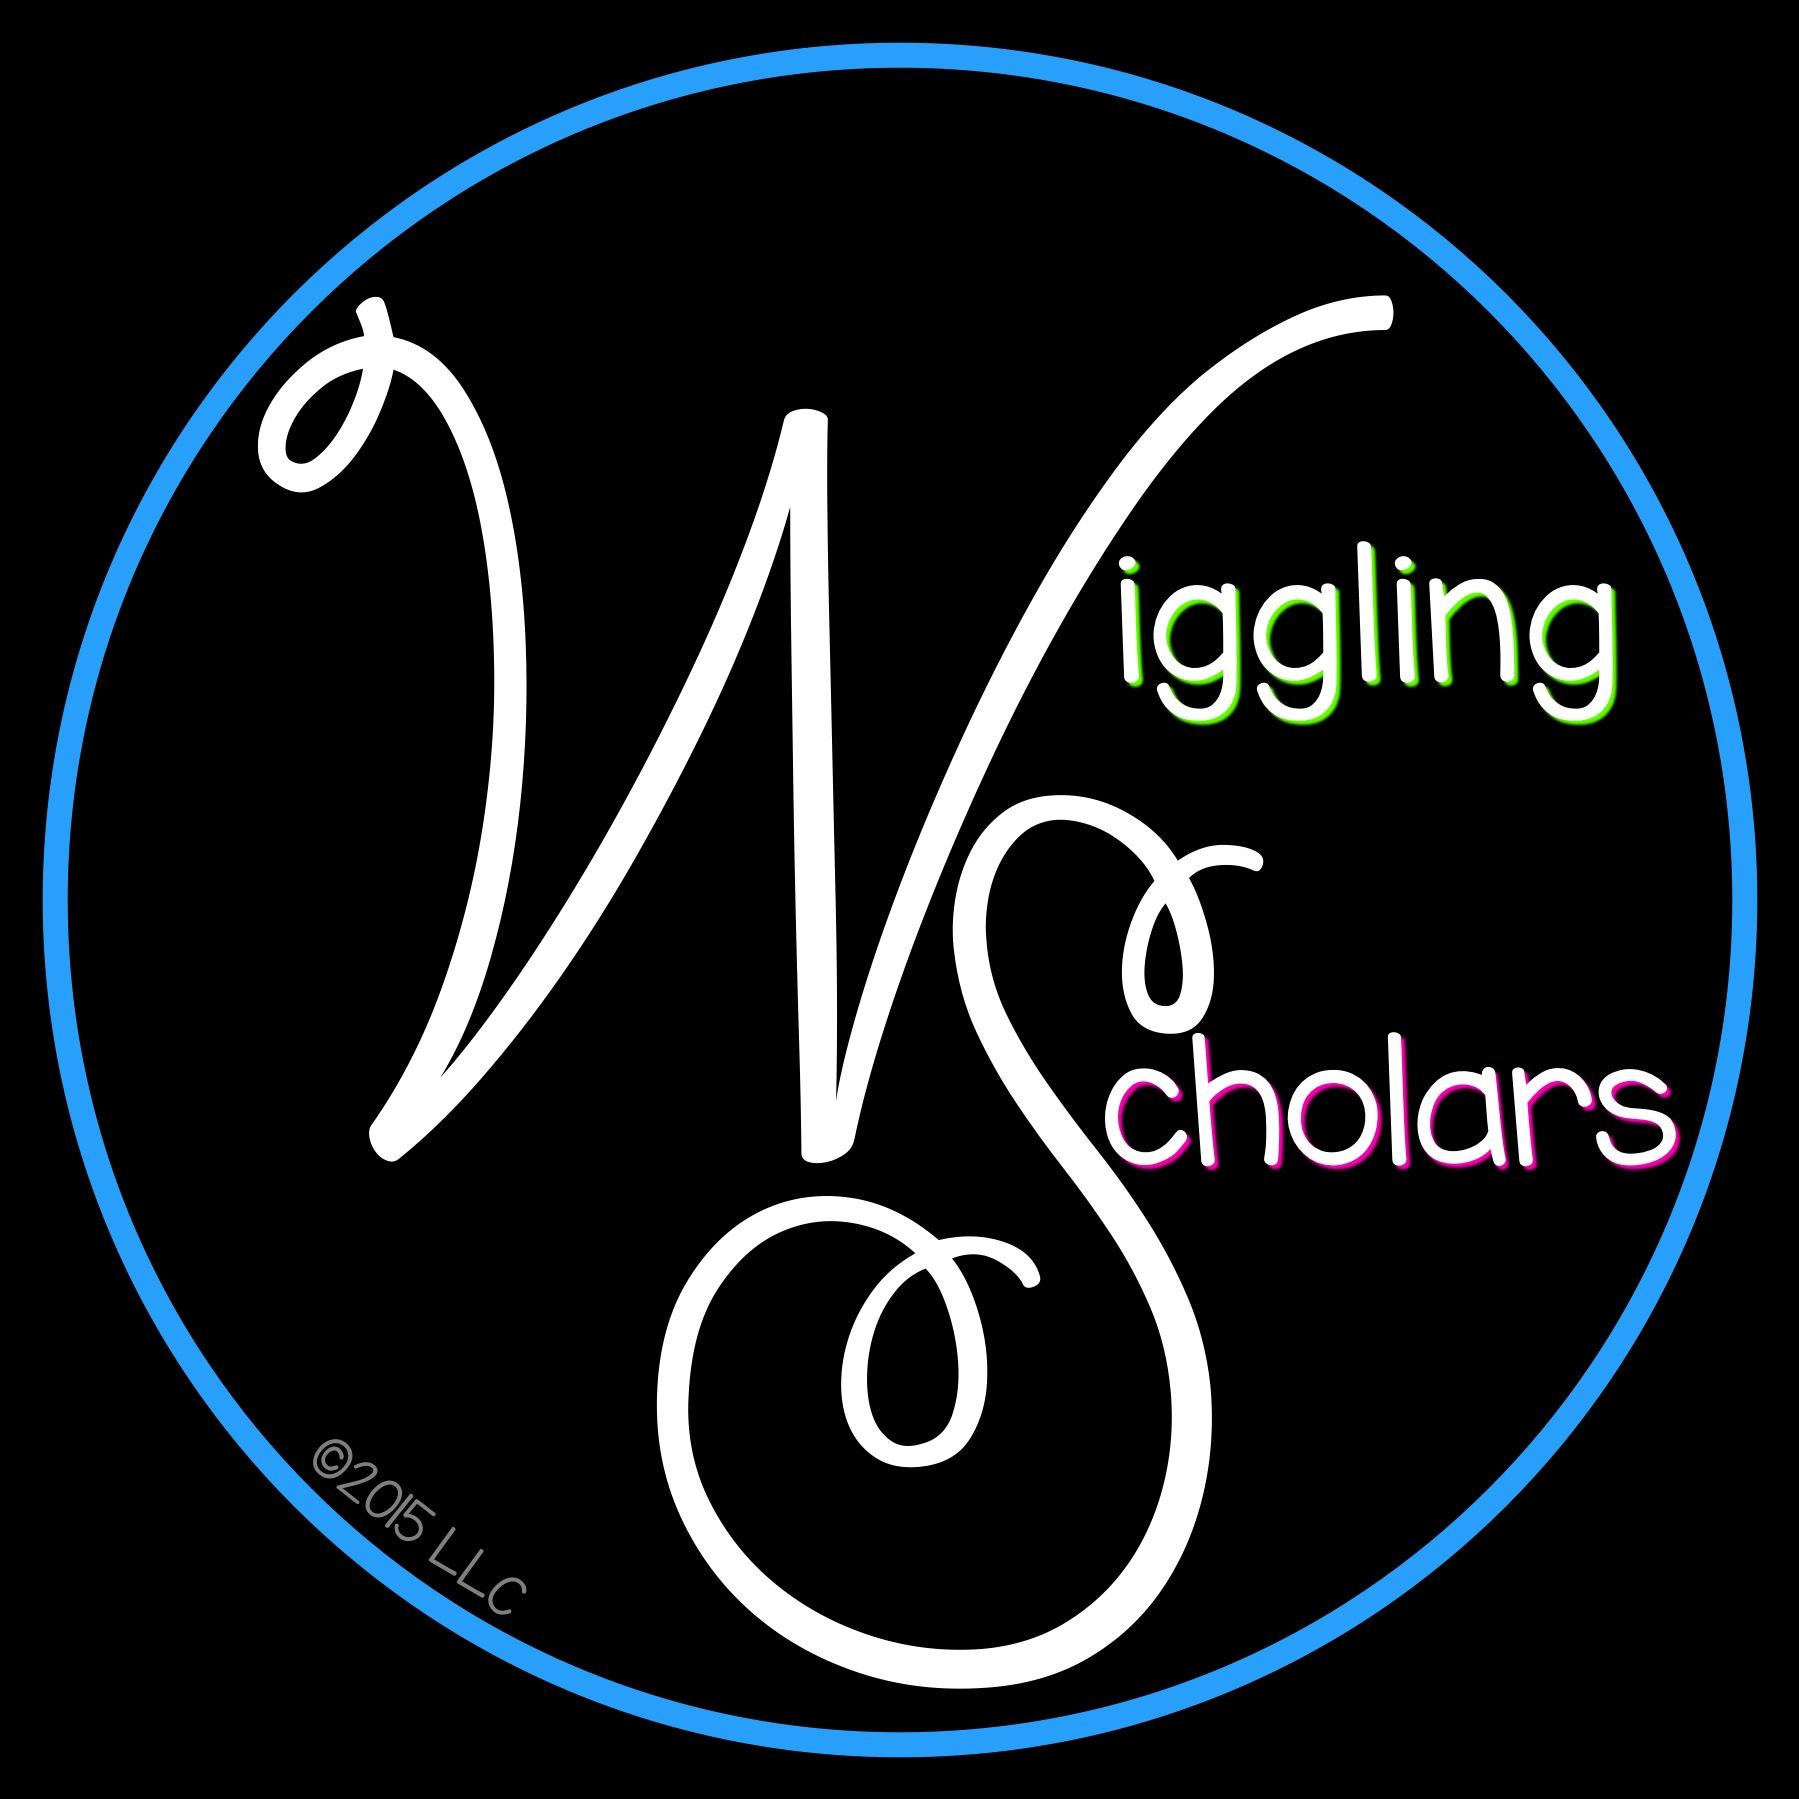 Wiggling Scholars Color Fun New Logo